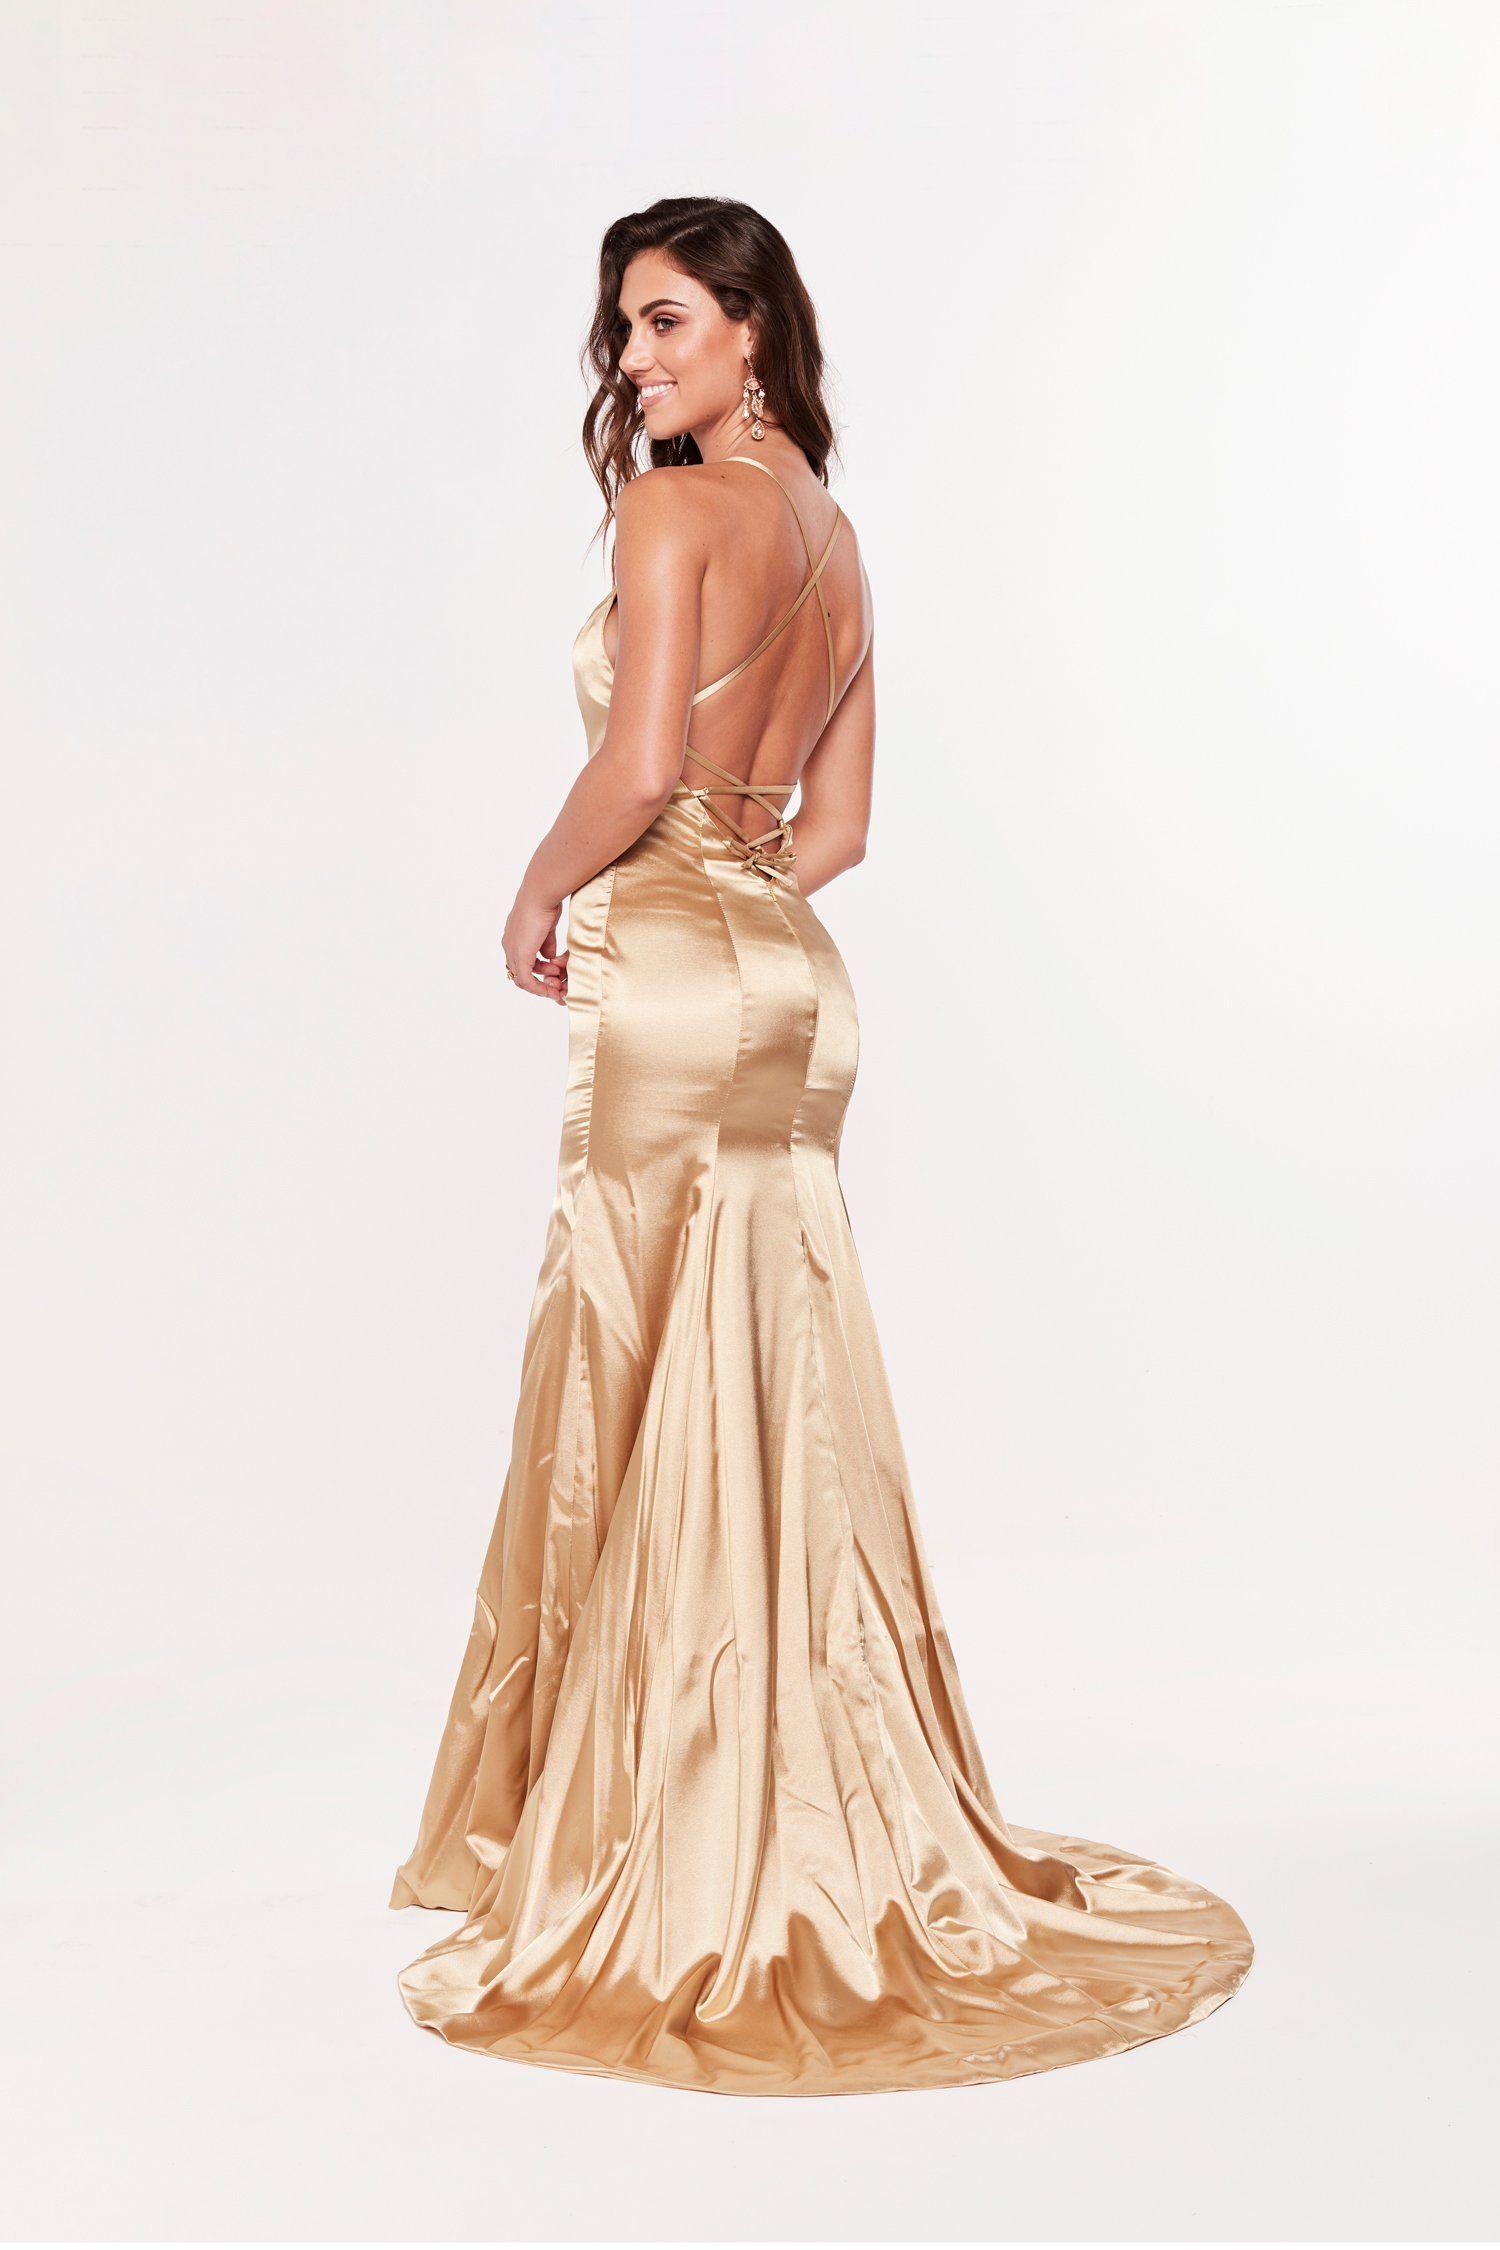 Gold Satin Prom Dress Vestidos Roupas [ 2250 x 1500 Pixel ]